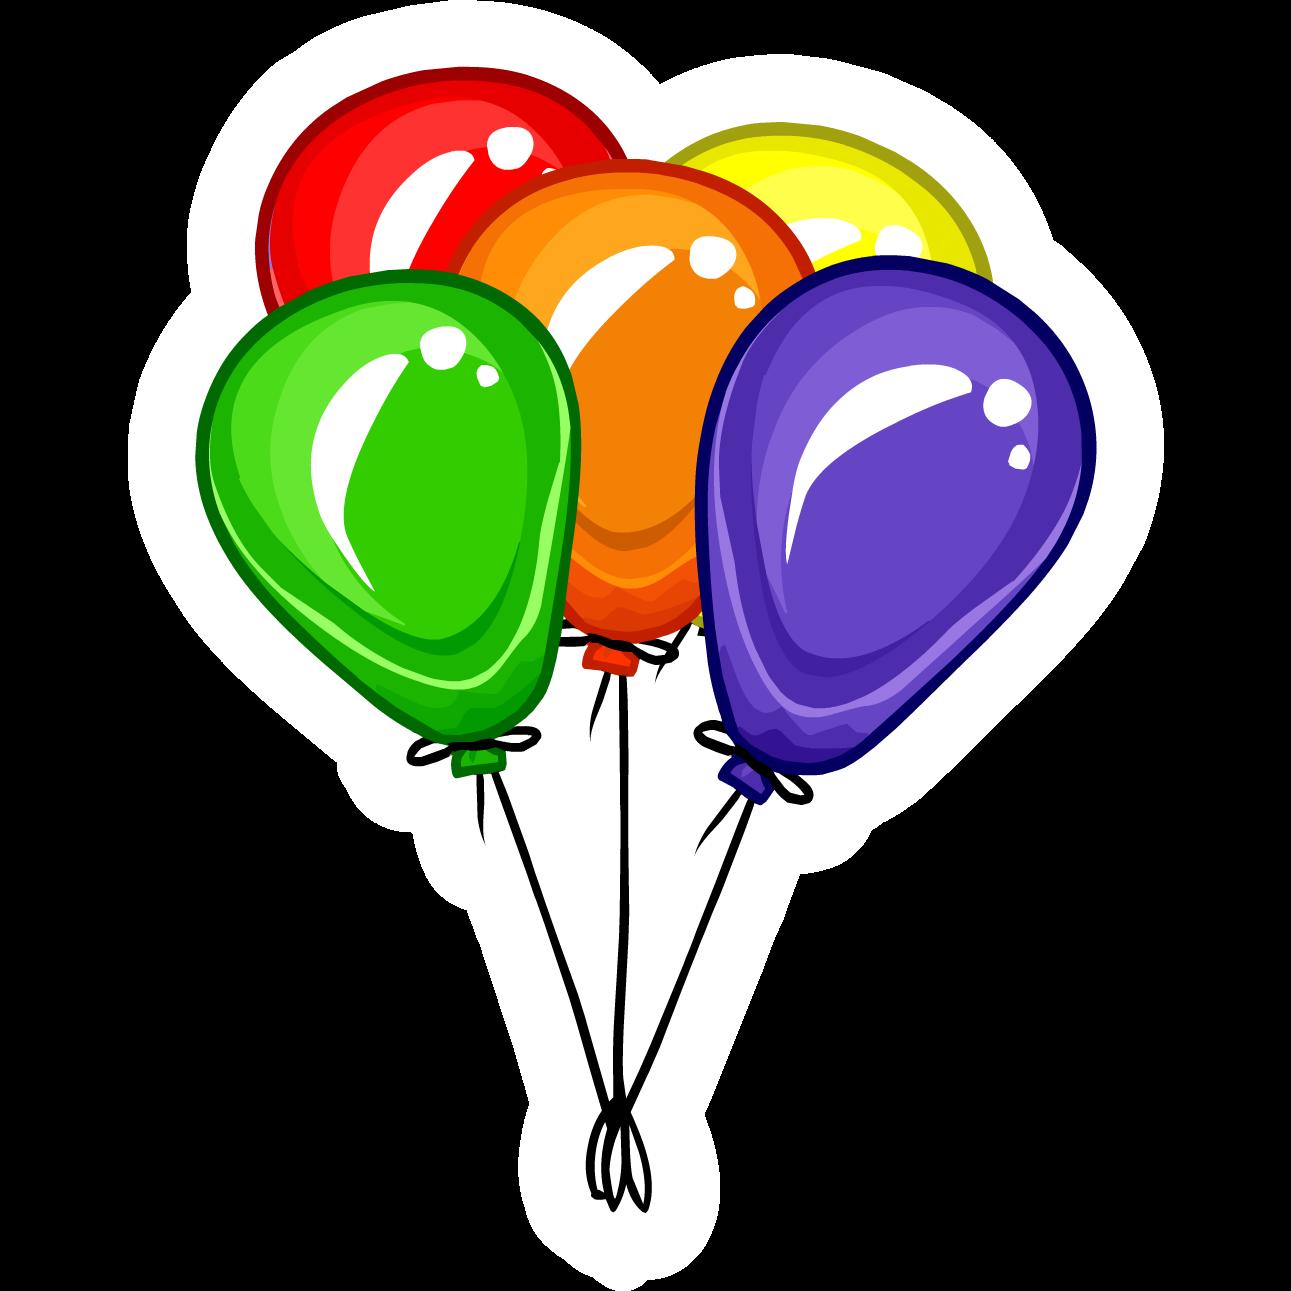 Balloons panda free images. Clipart png balloon